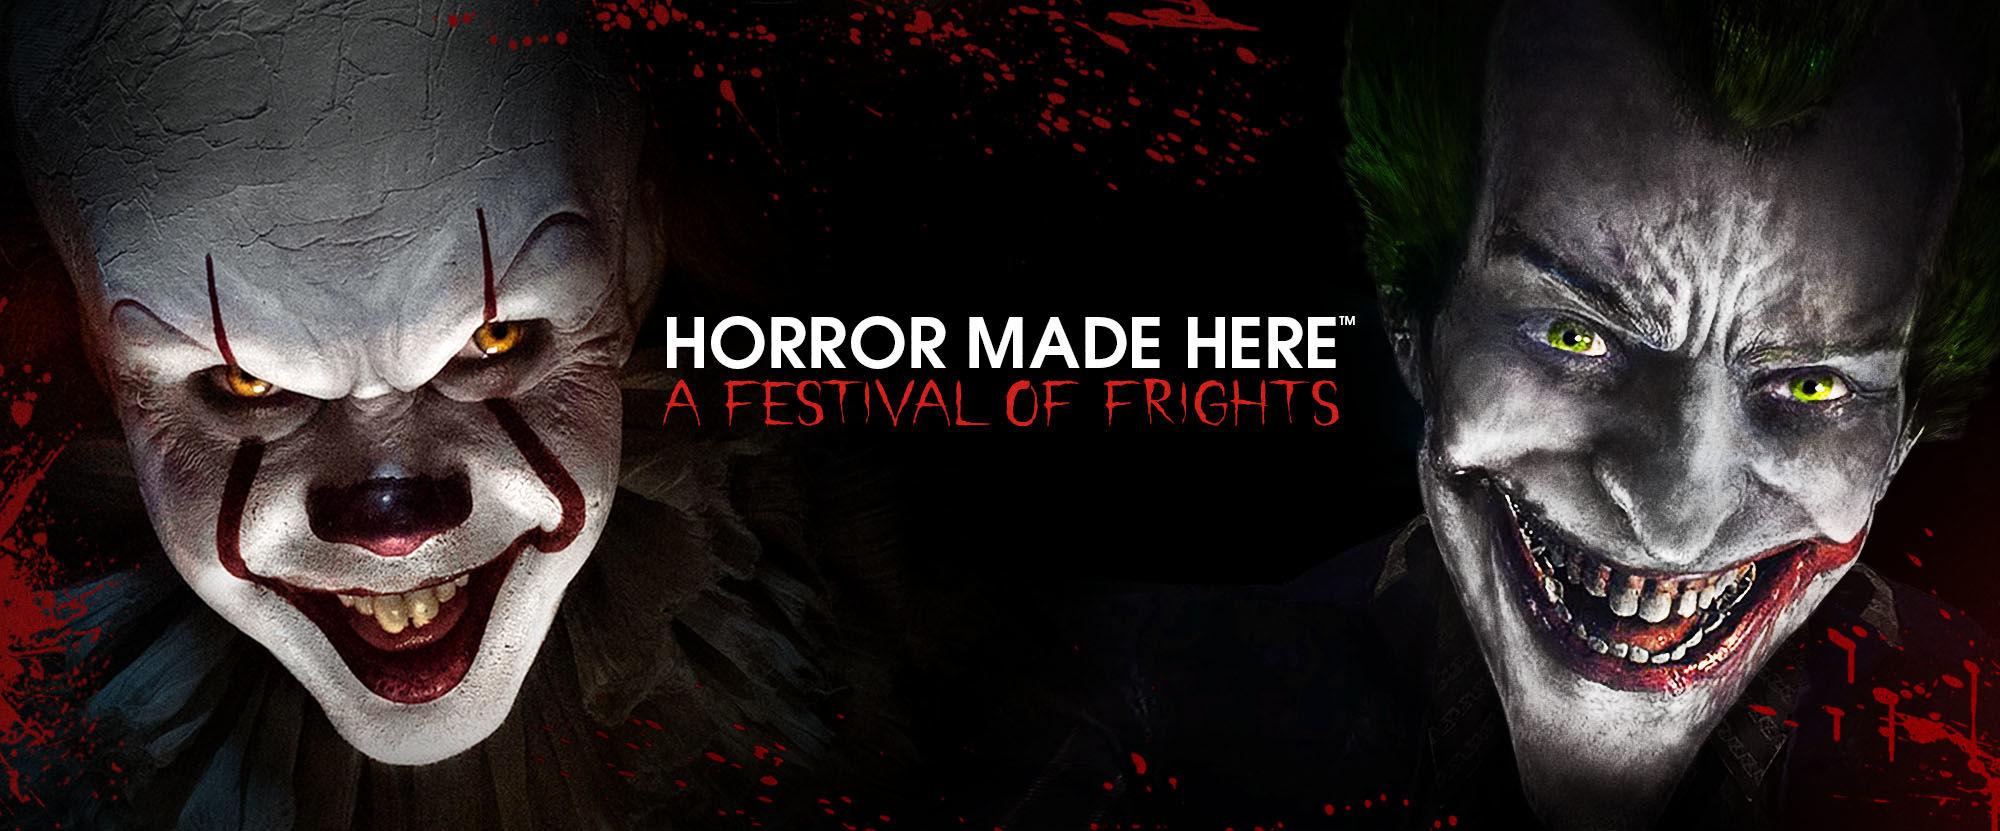 Logo courtesy of Warner Bros. Studios  ( https://www.wbstudiotour.com/horror-made-here )